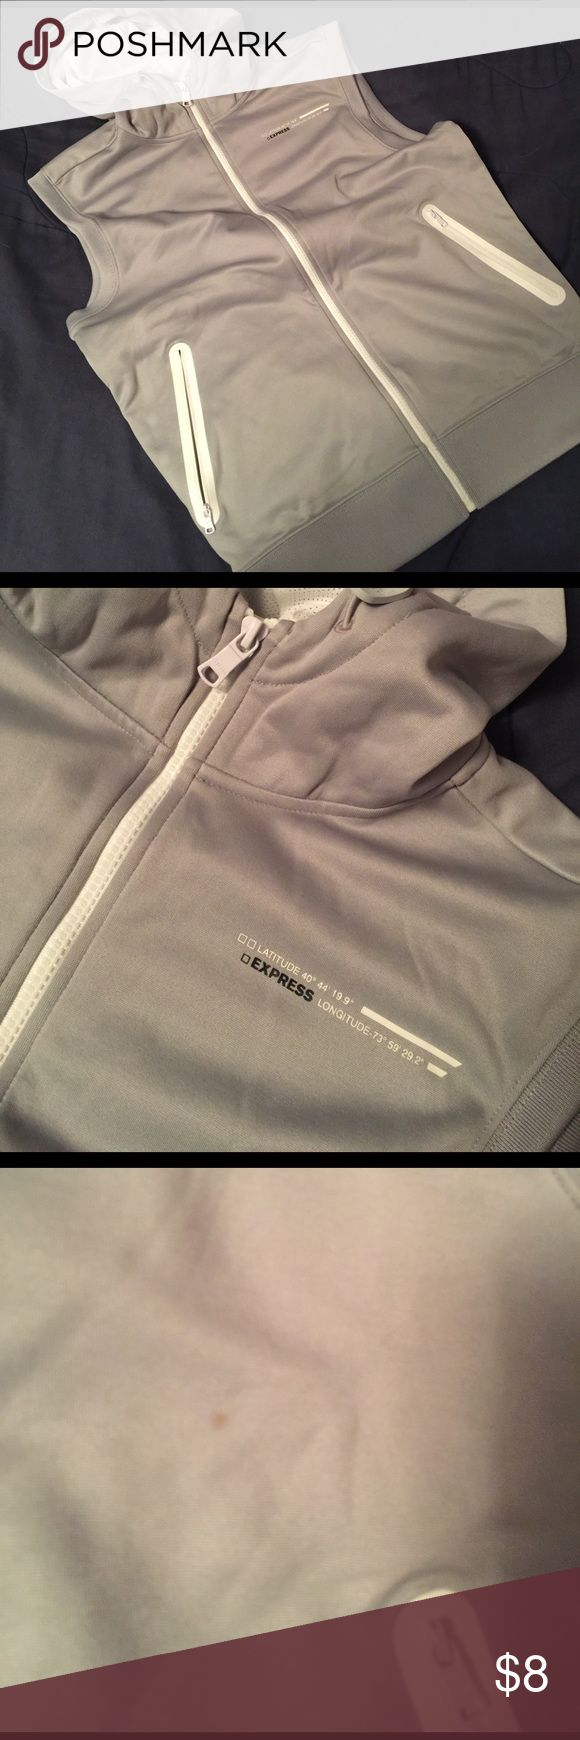 Men's Express Sleeveless Hoodie Men's Express grey sleeveless hoodie. Zip front, zip front pockets. Fleece lined inside. Size S. Tiny stain near pocket (see pic). Express Jackets & Coats Performance Jackets